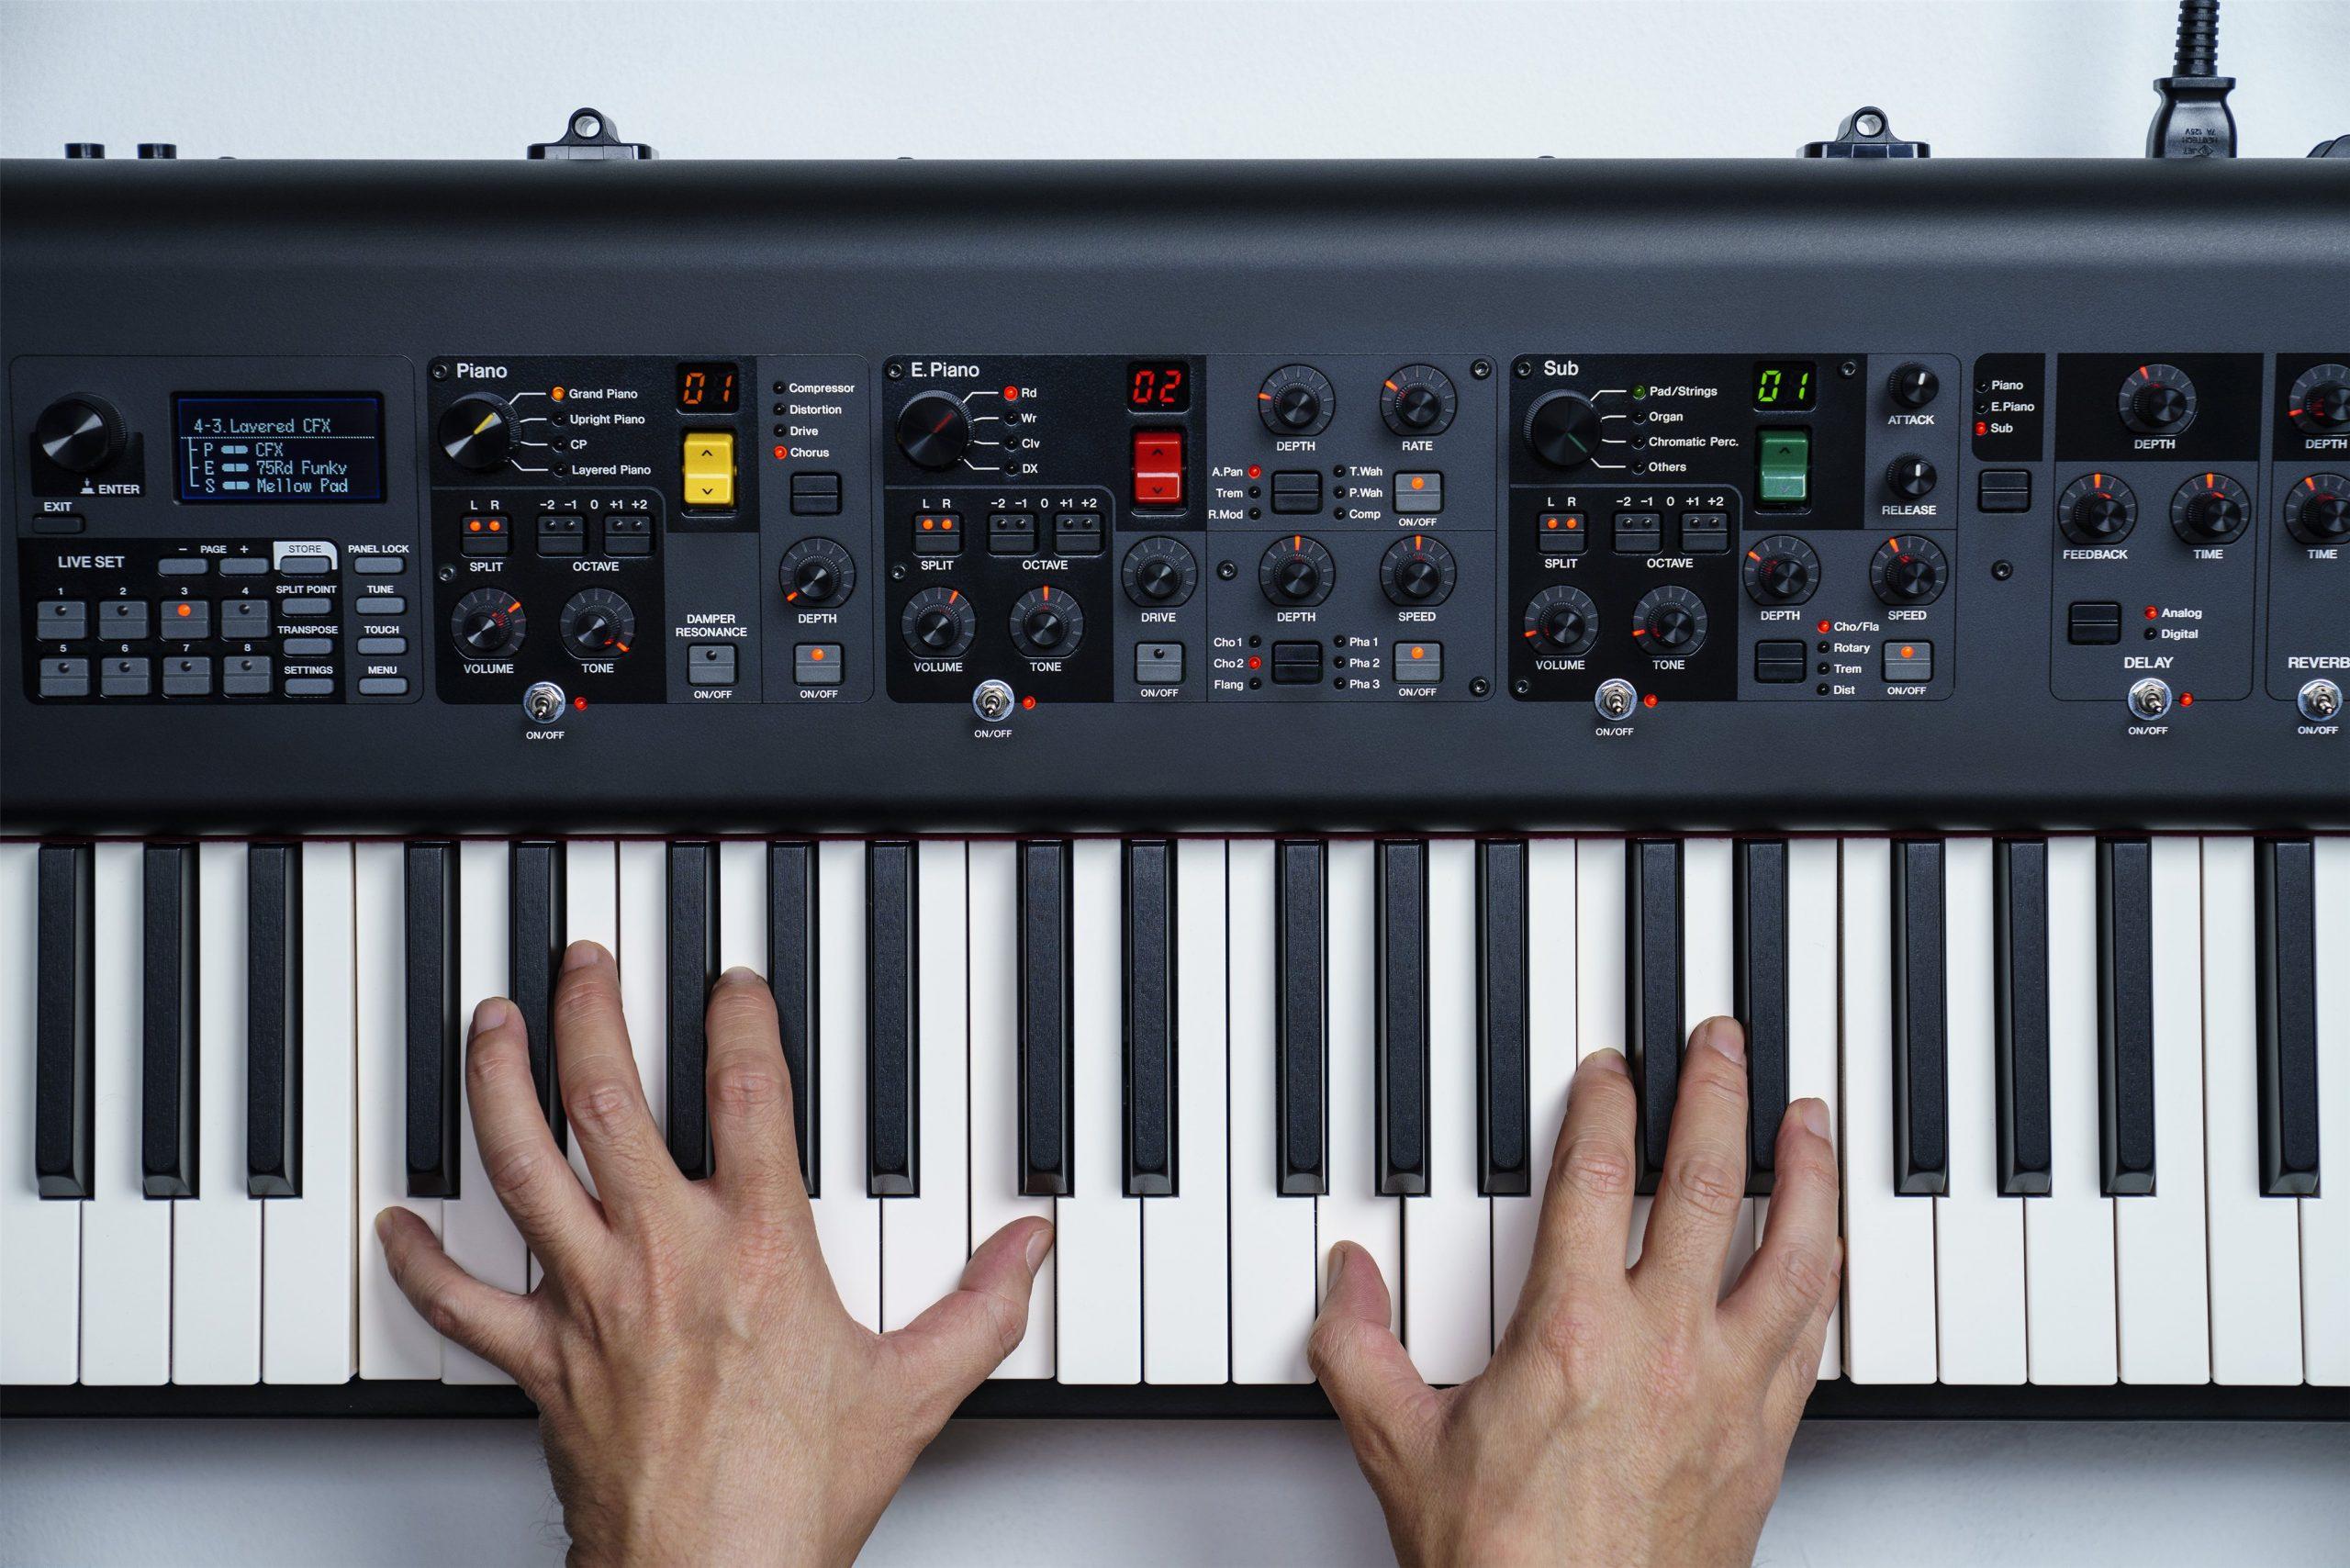 Keys of Yamaha CP88